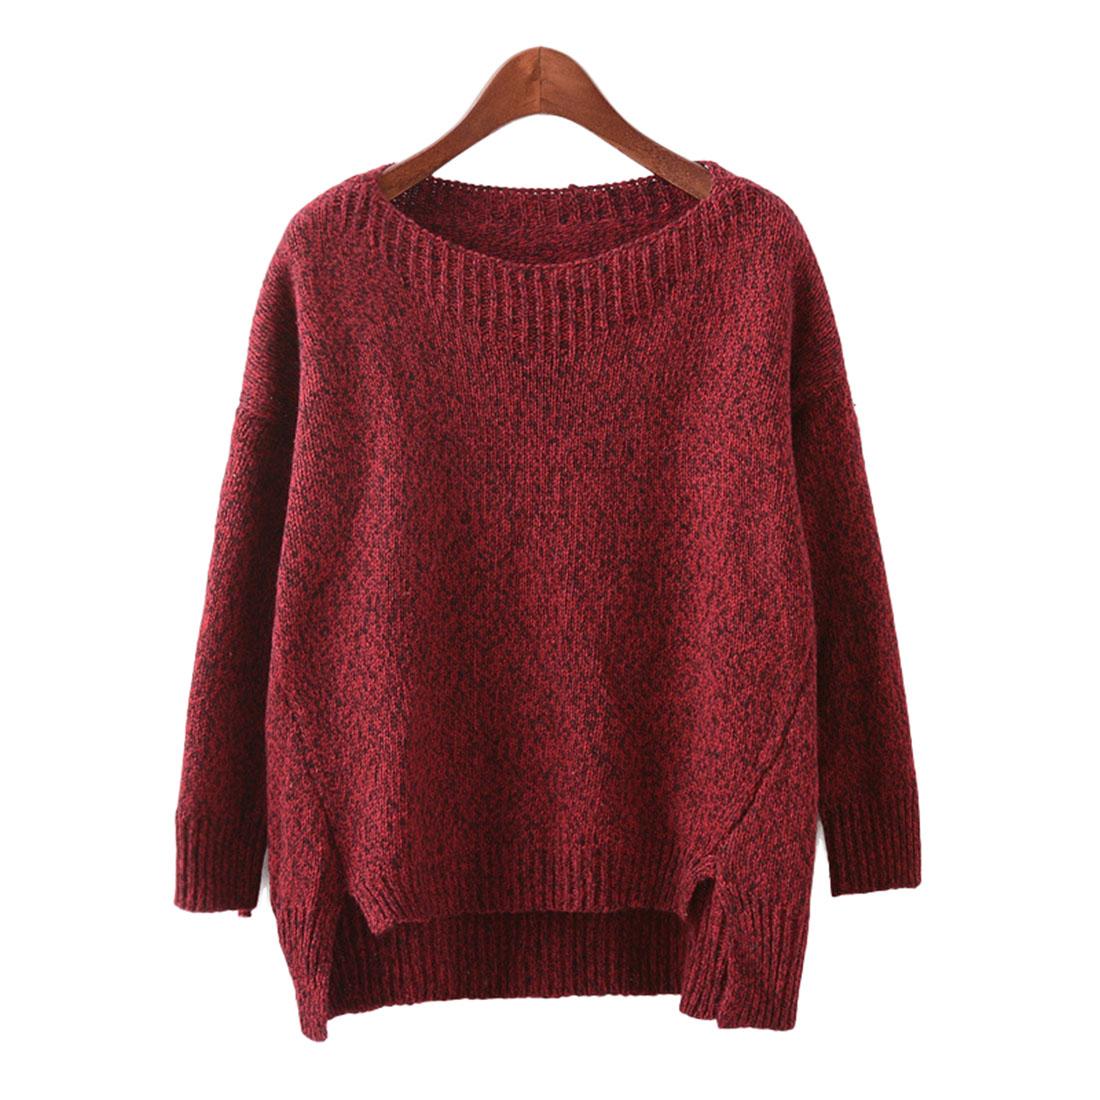 Mixed Fabric Amp Acrylic Women Sweater Slimming Amp Short